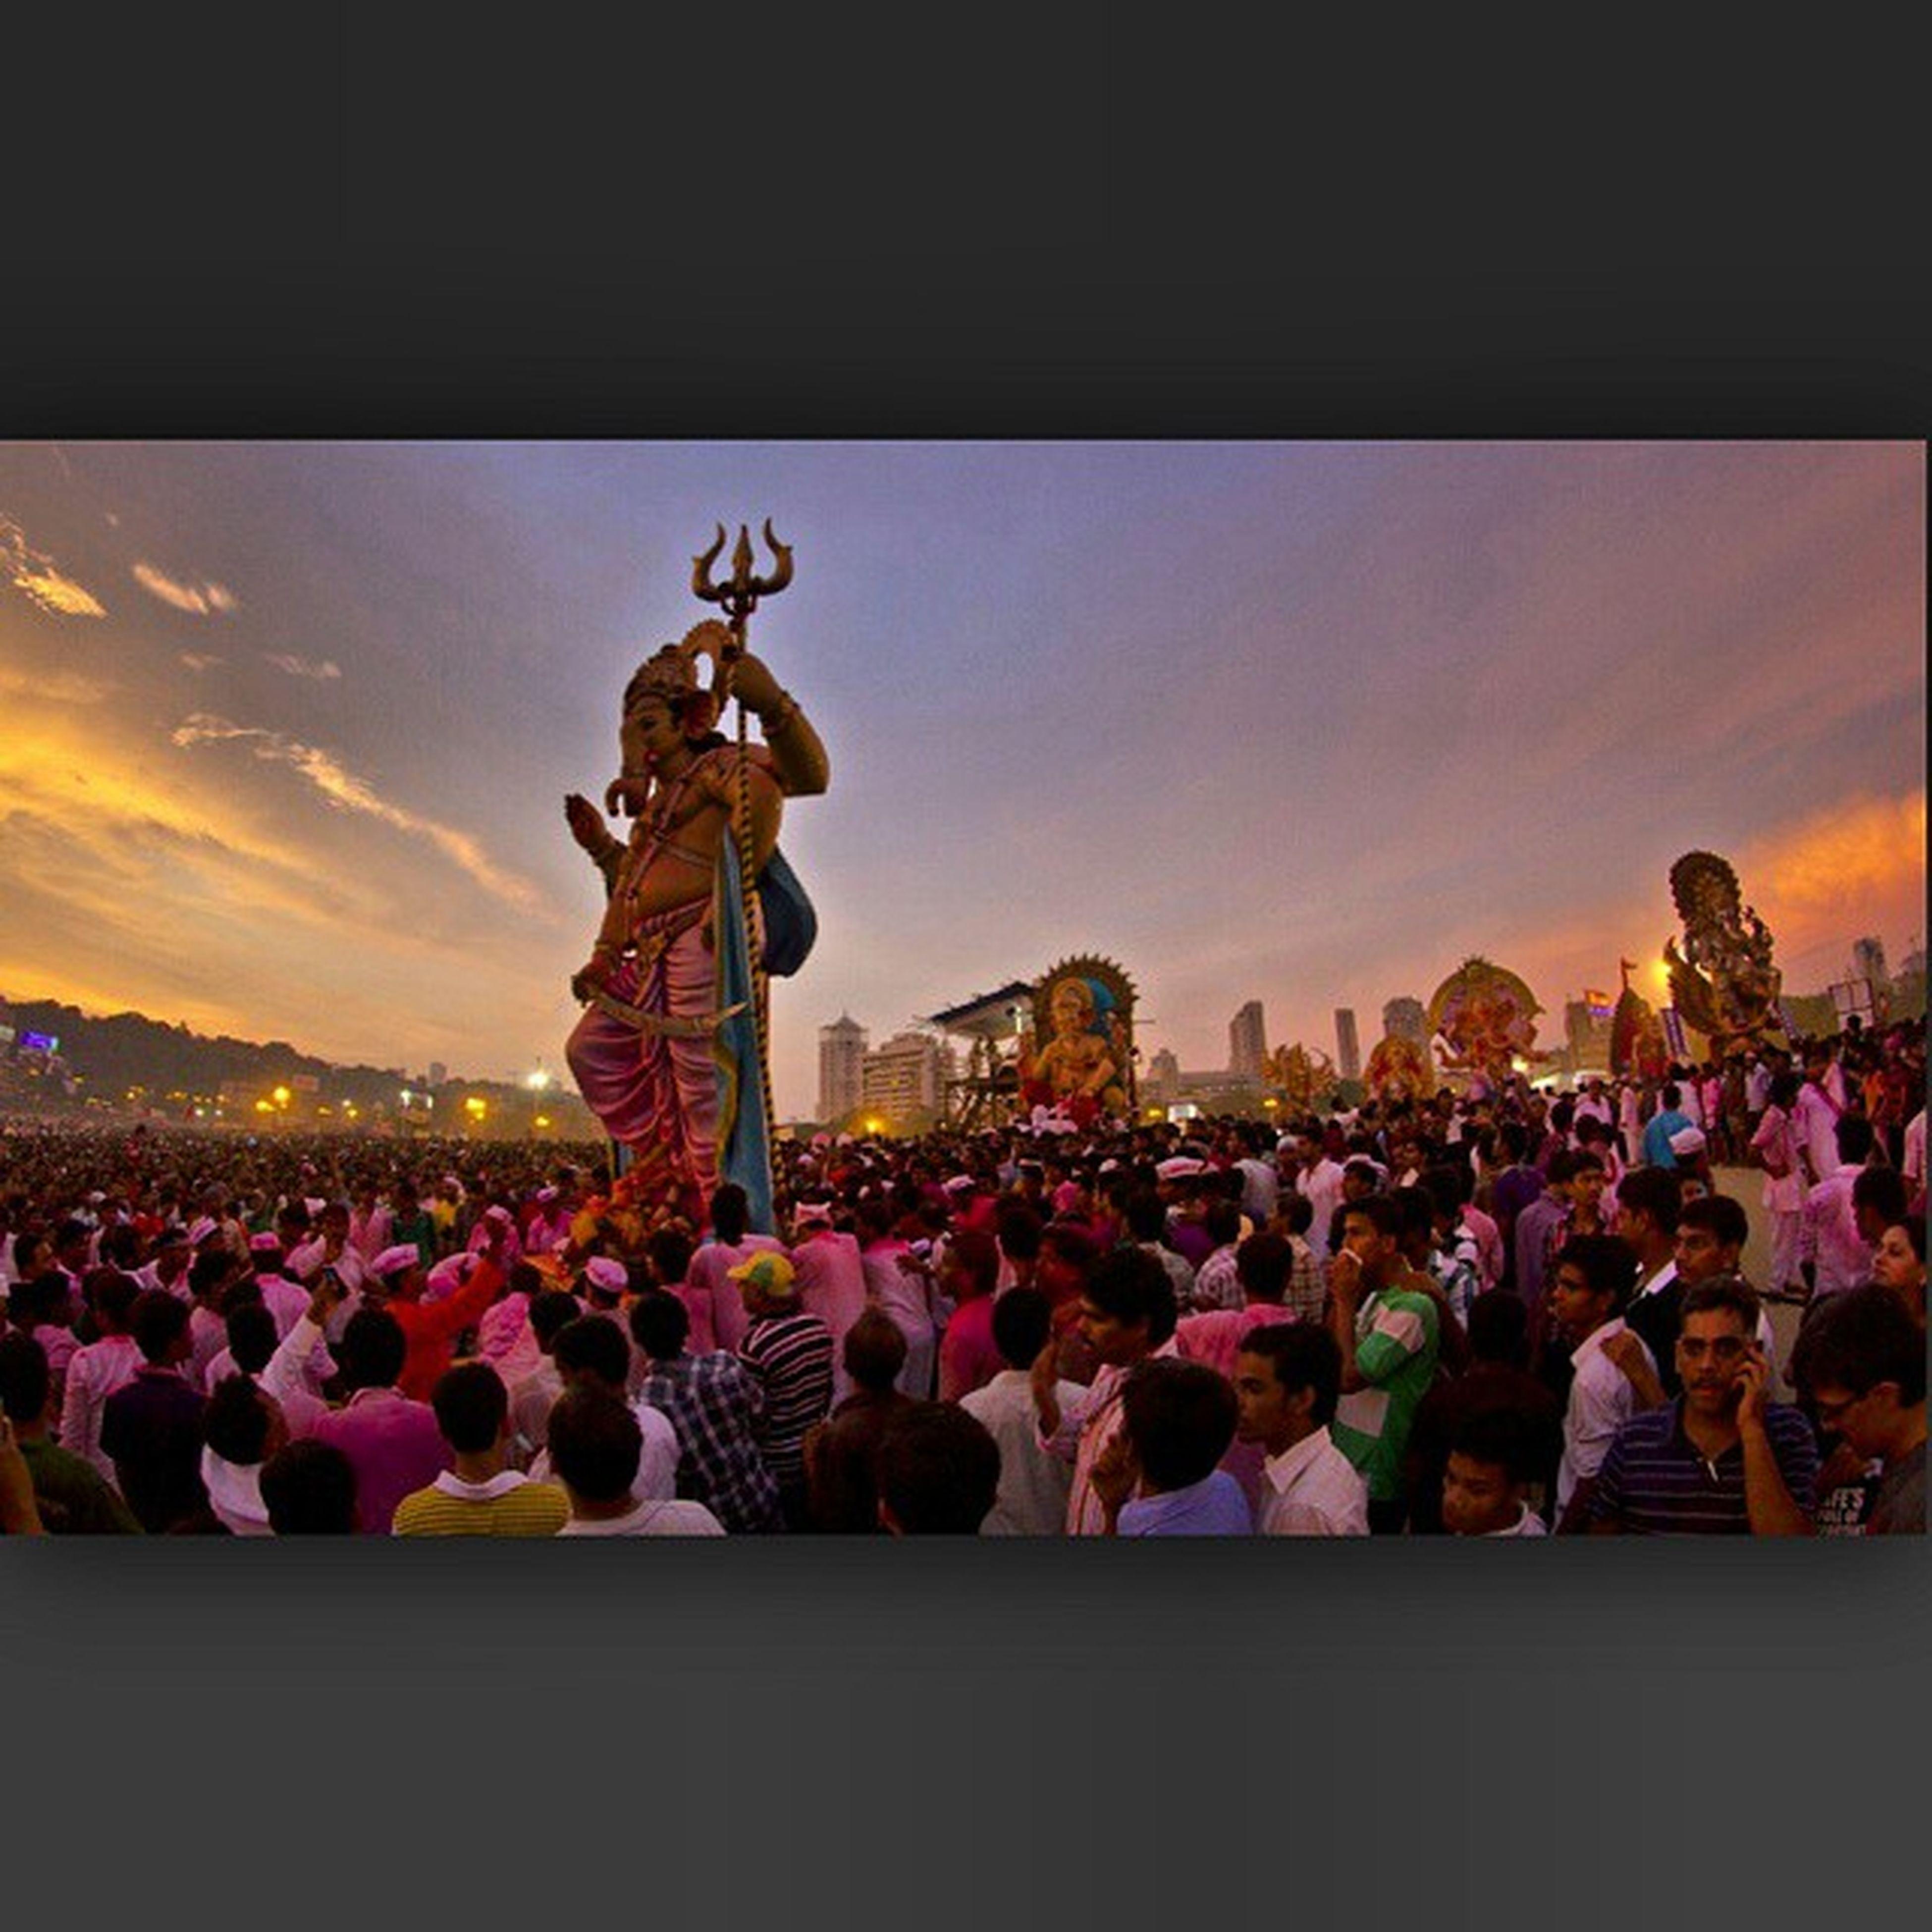 So anant-chaturdashi is here !! Festivalend Festival Mumbai Instamumbai streetphotography sunset sunset_madness